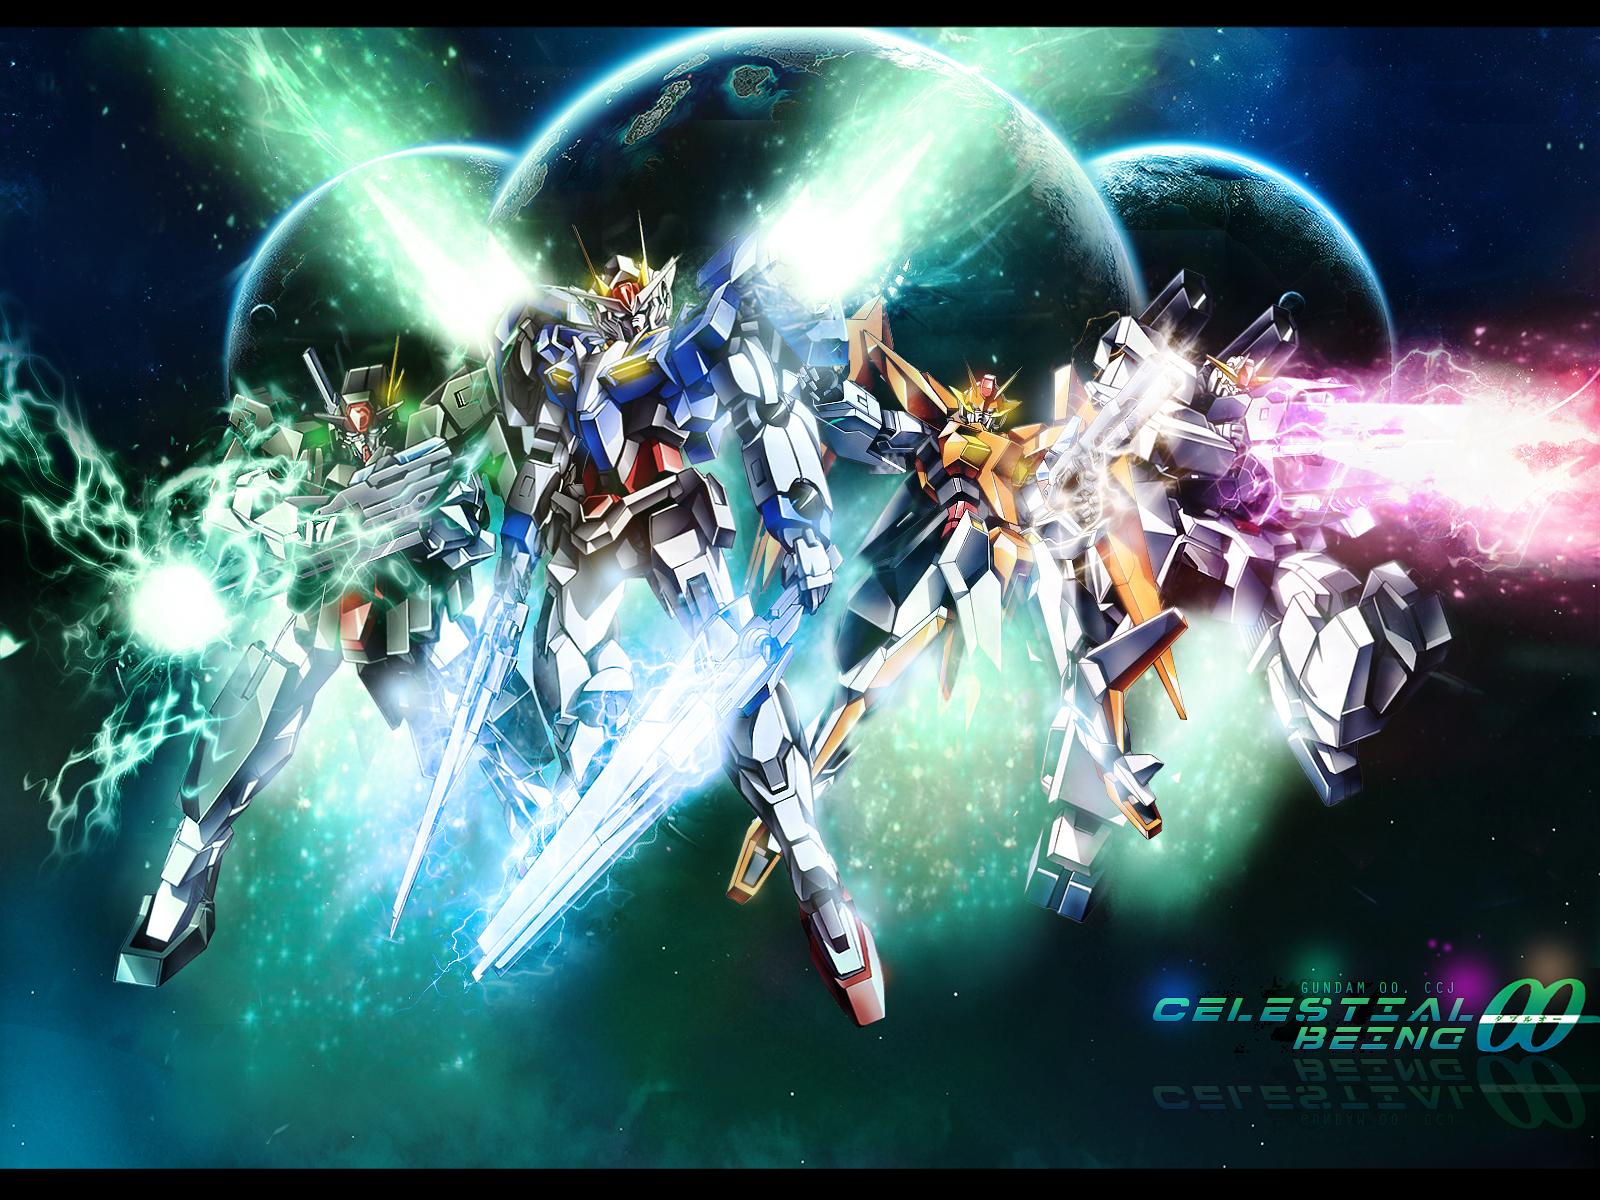 ... Planet, Fire, Mobile Suit Gundam 00, 1600x1200 Wallpaper, Mecha, Cyber